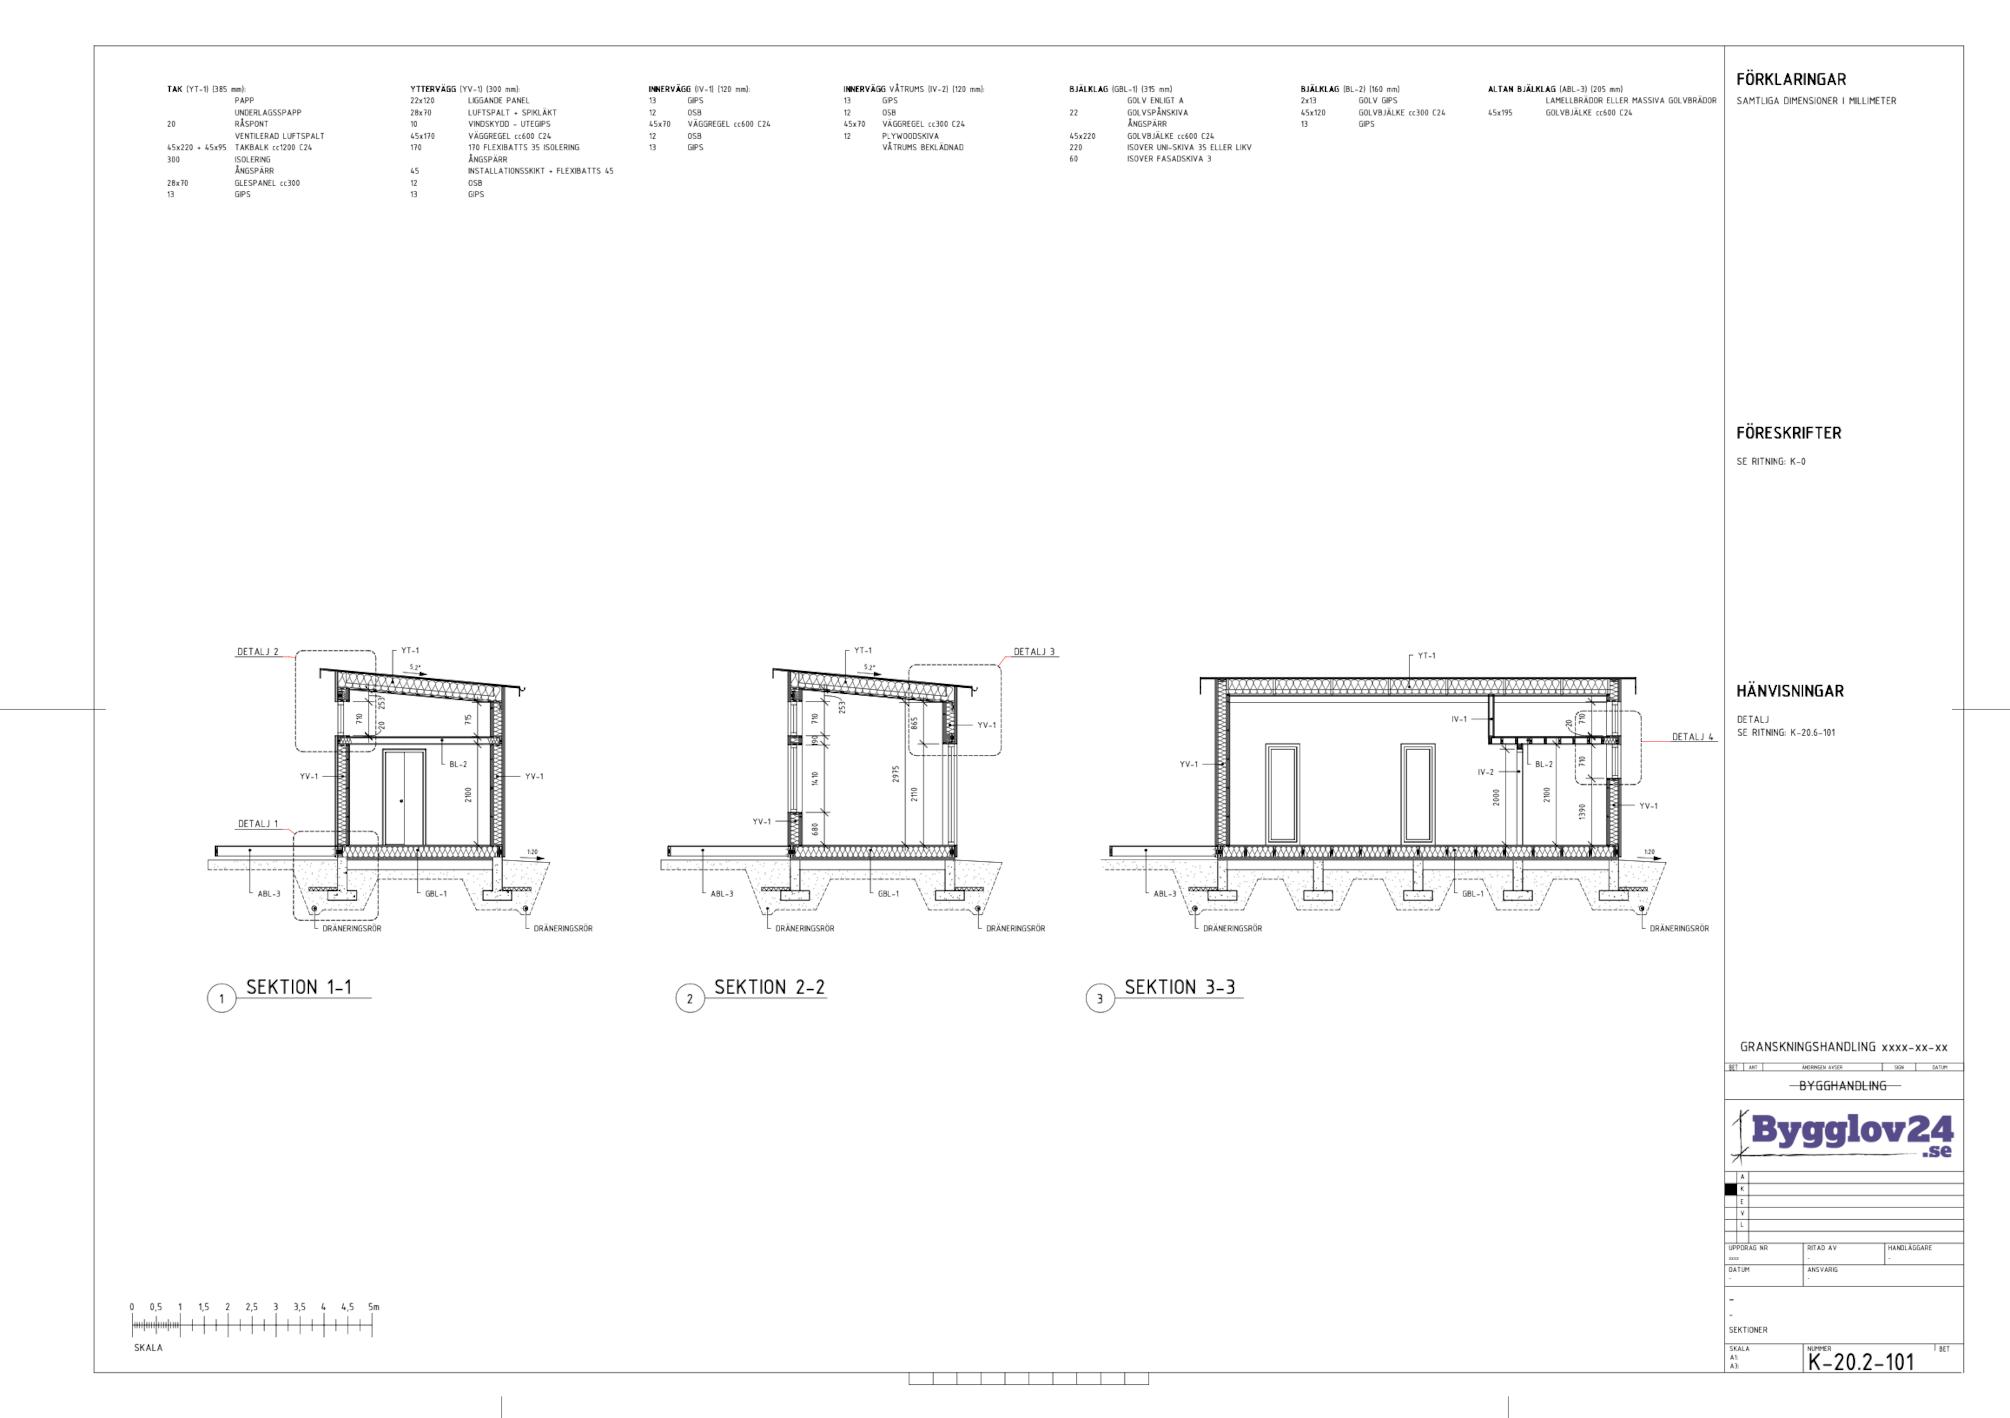 Sektioner i en konstruktionsritning av ett attefallshus på 30 kvm